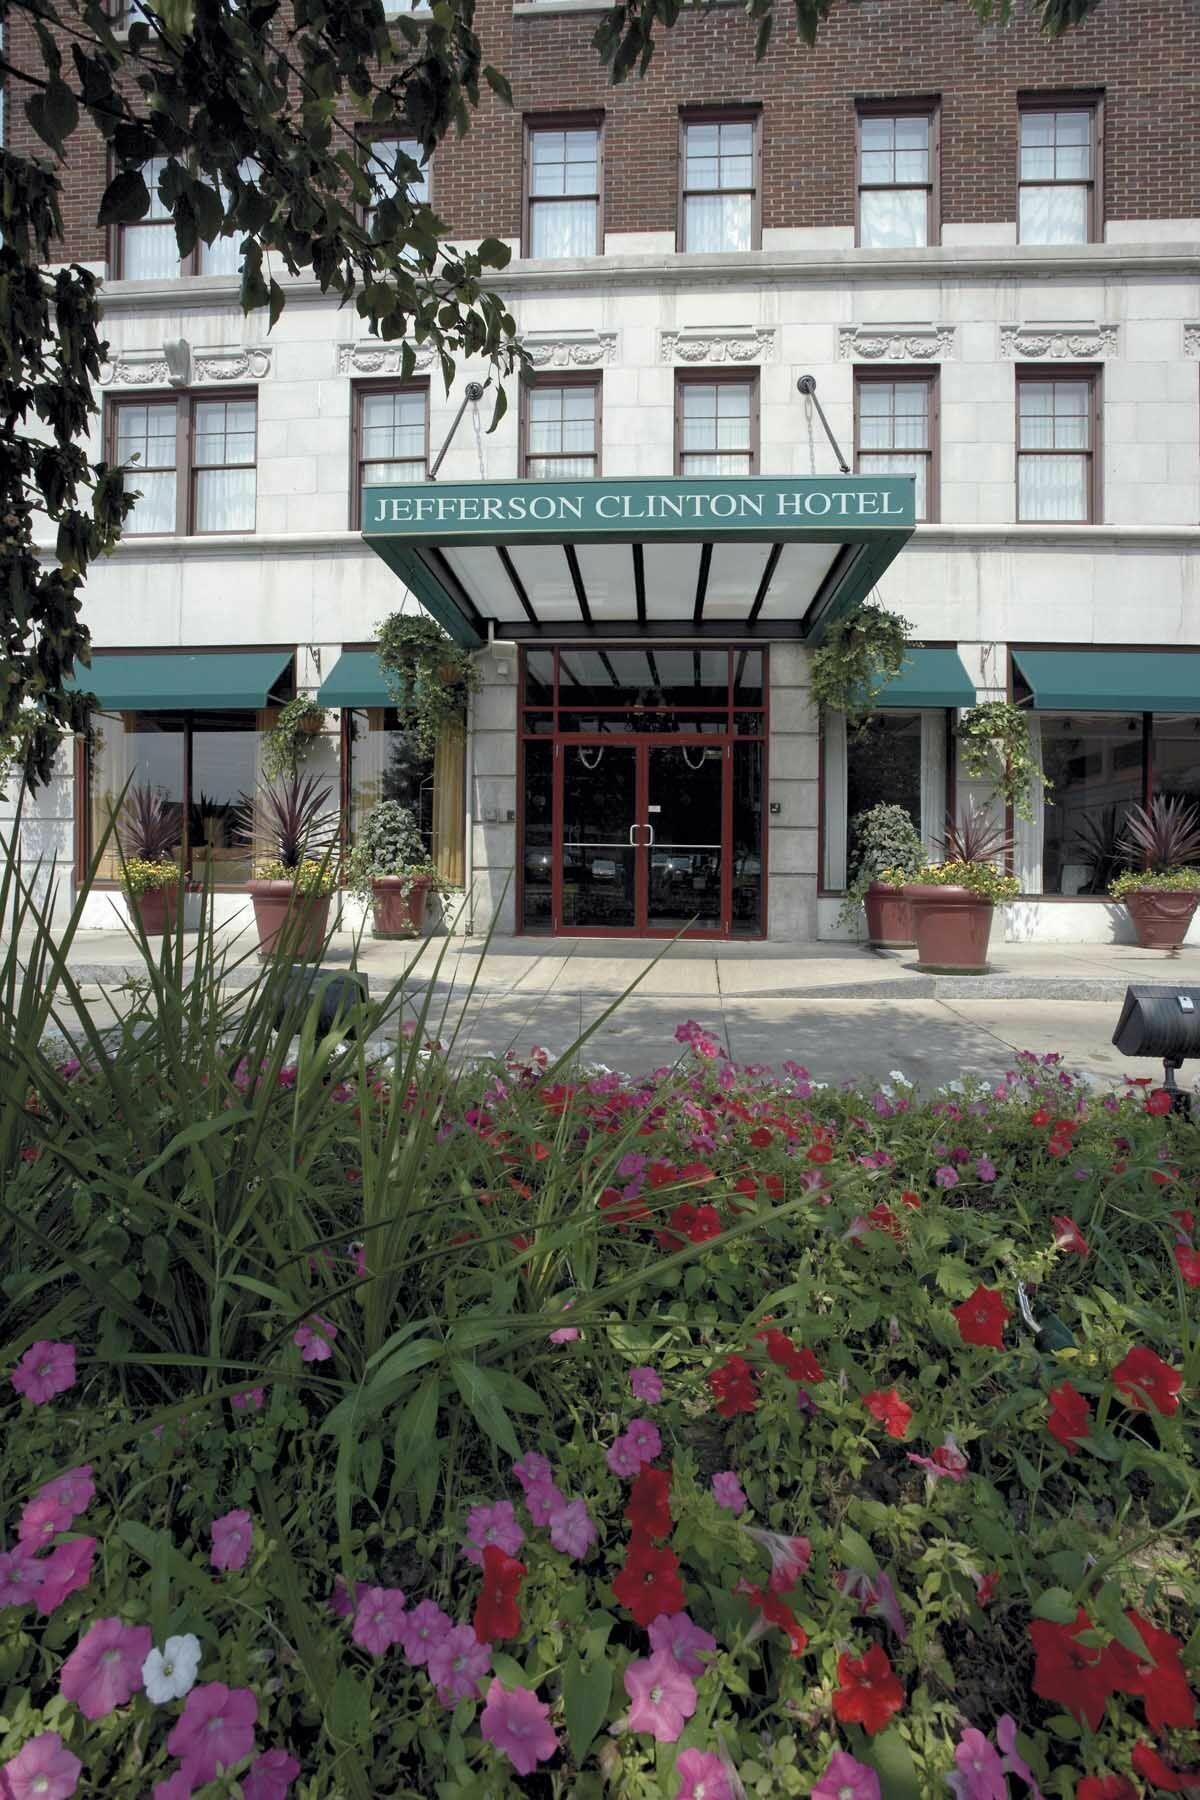 Exterior of Jefferson Clinton Hotel